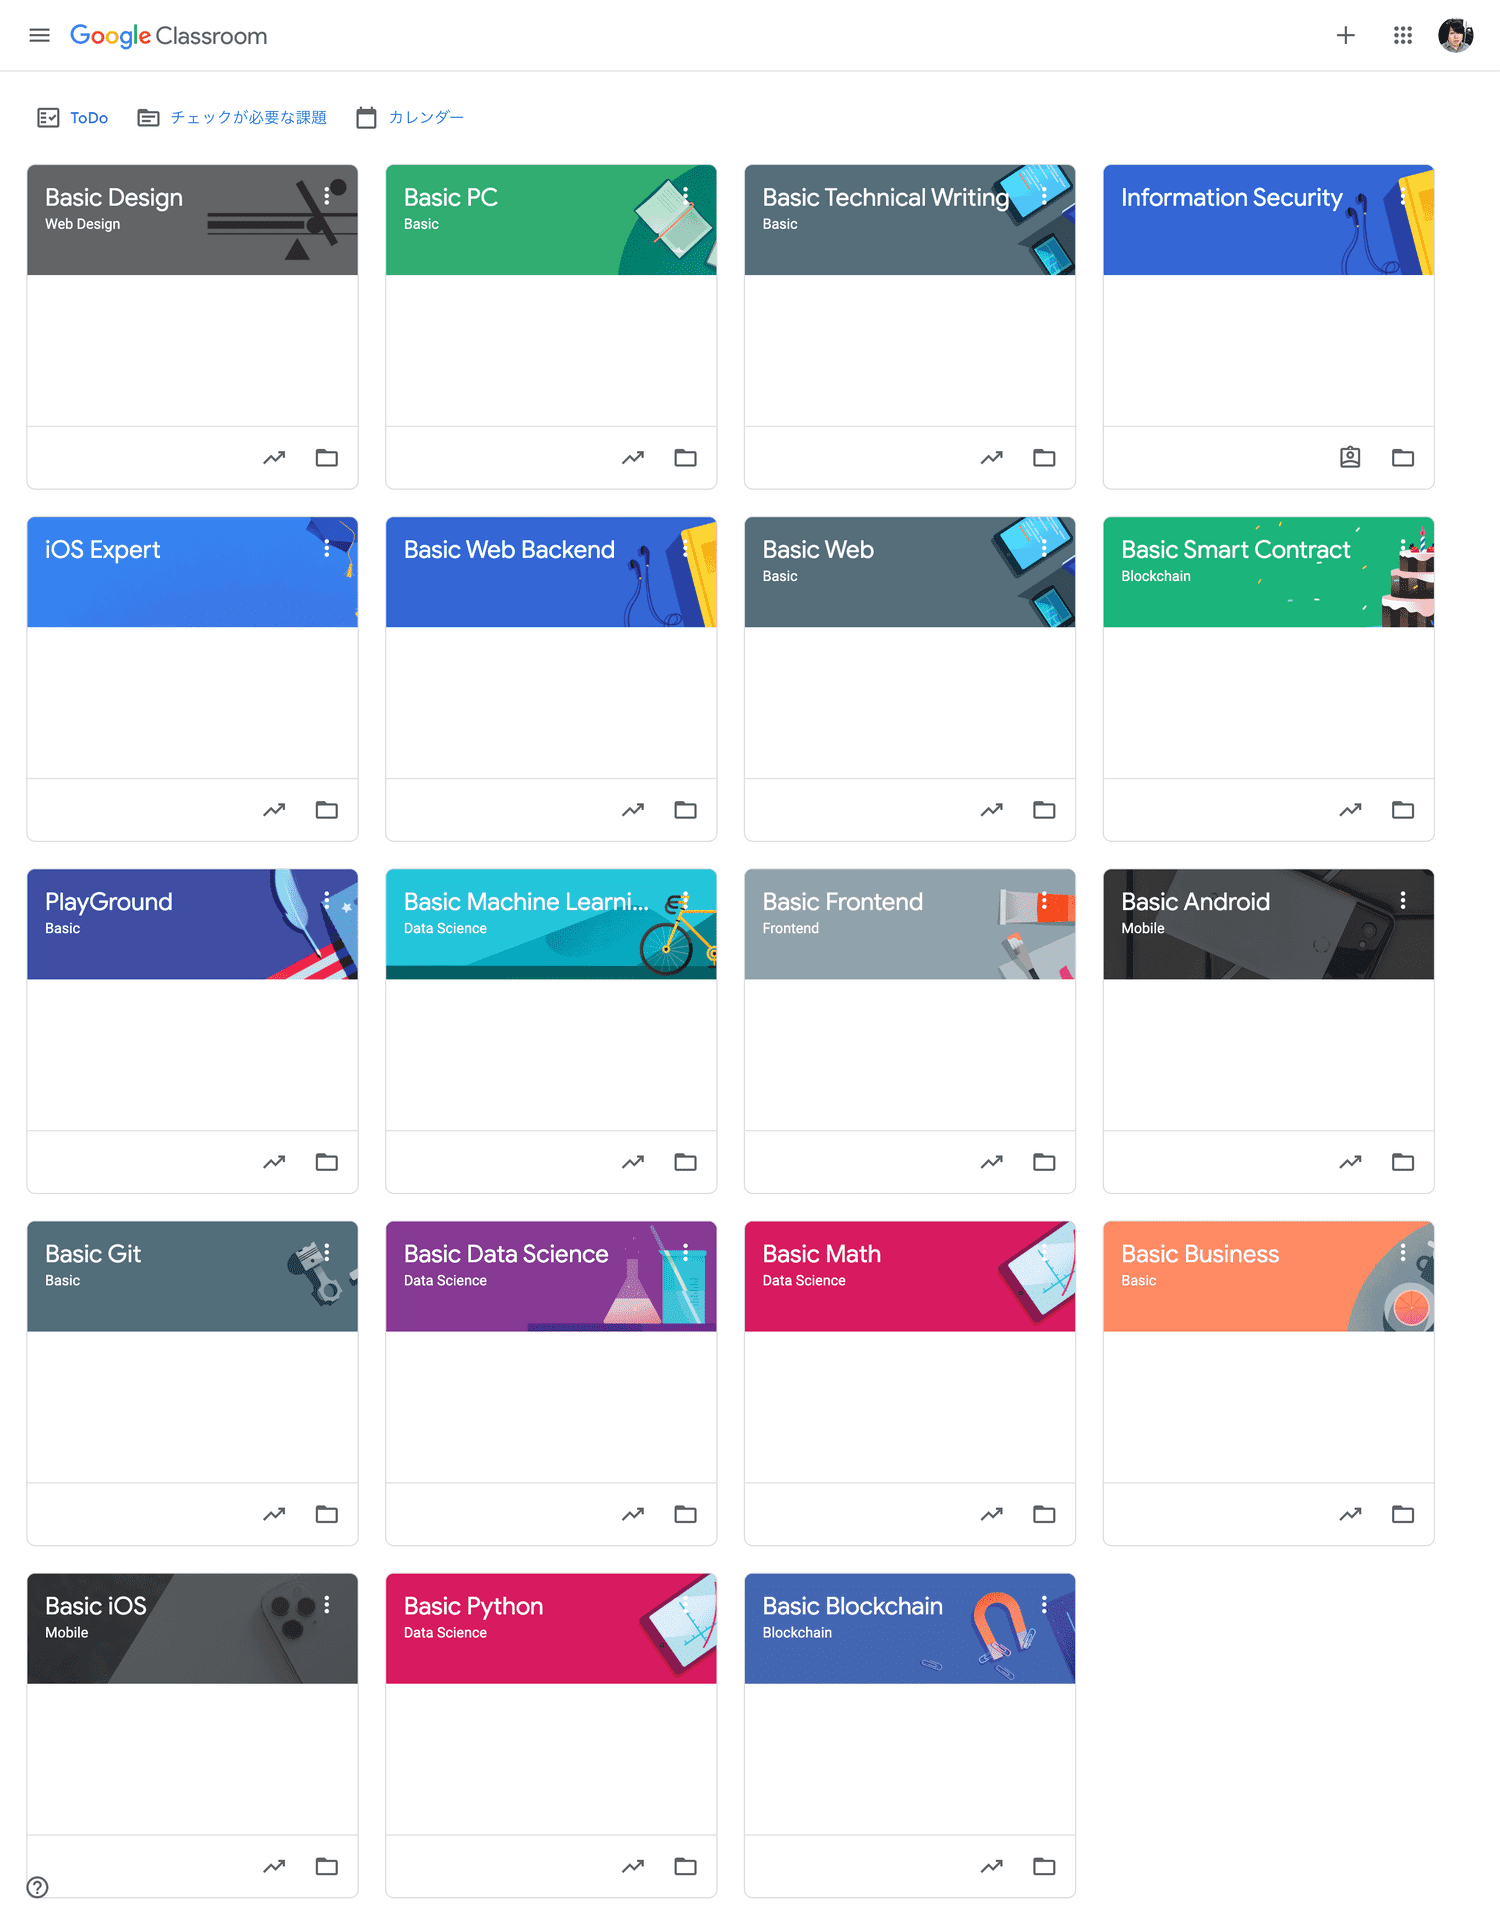 Google Classroom で管理し、基礎学習を含めた全19教材を提供